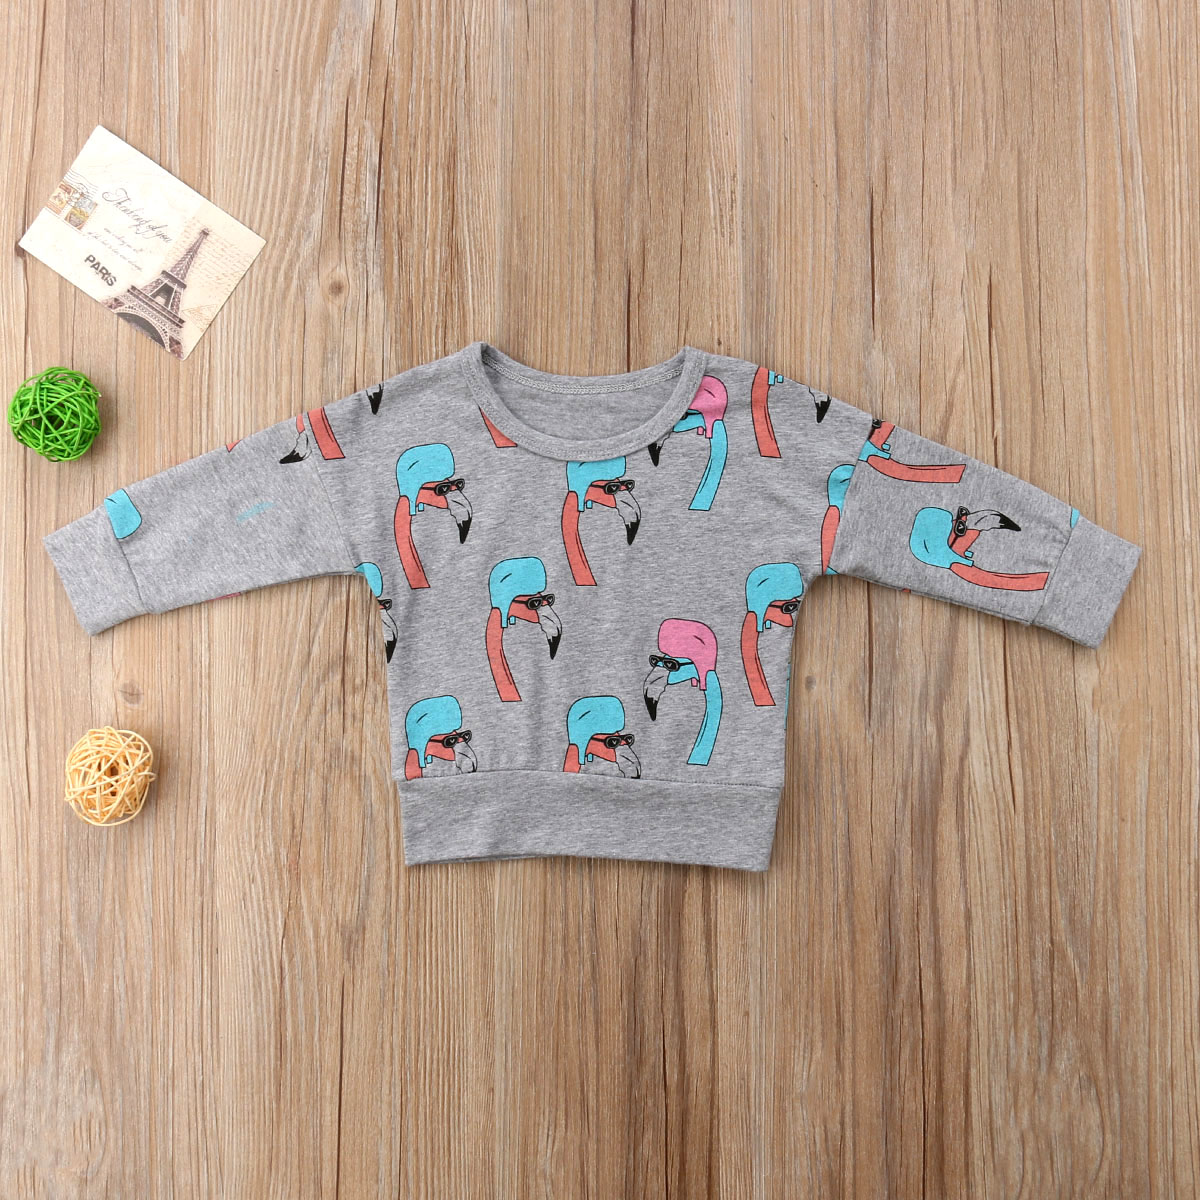 b9abbec64 2018 Newborn Baby Boys Girls Flamingo Sweatshirt Coat Jacket Sweater ...